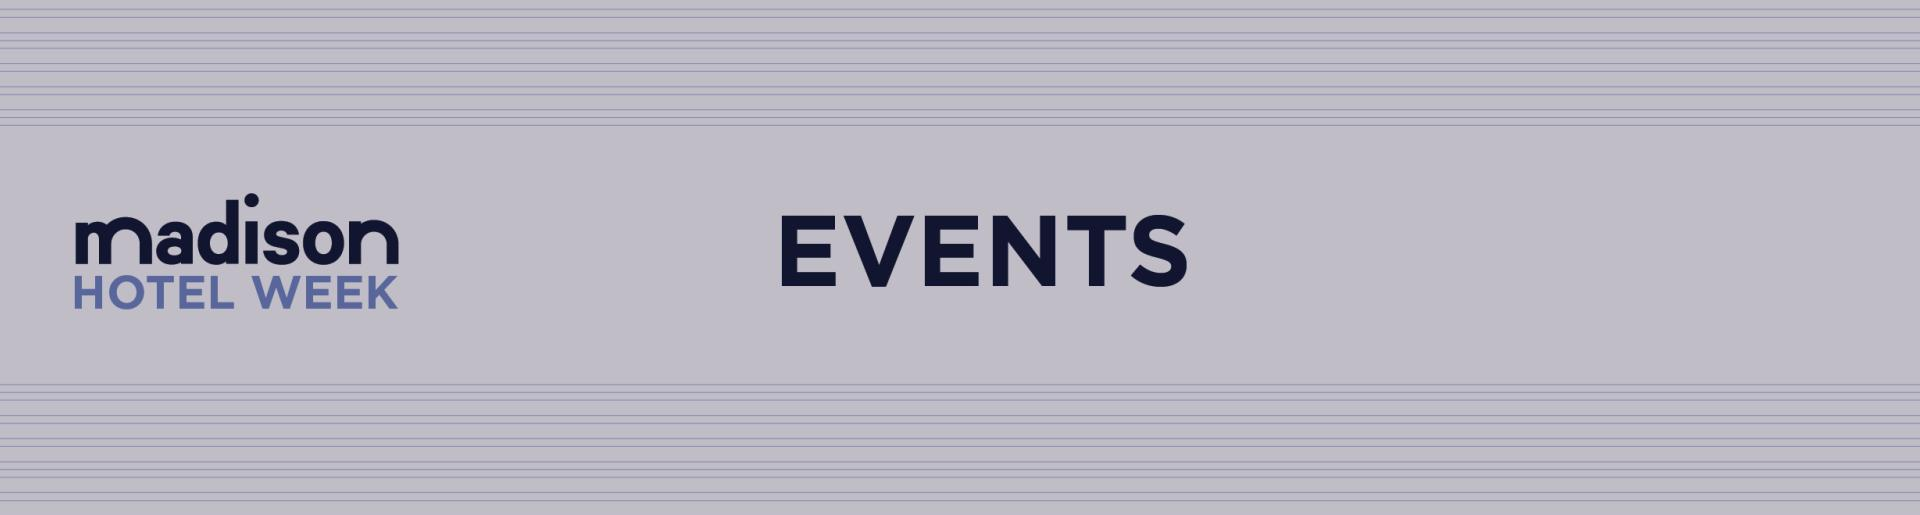 Madison Hotel Week: Events